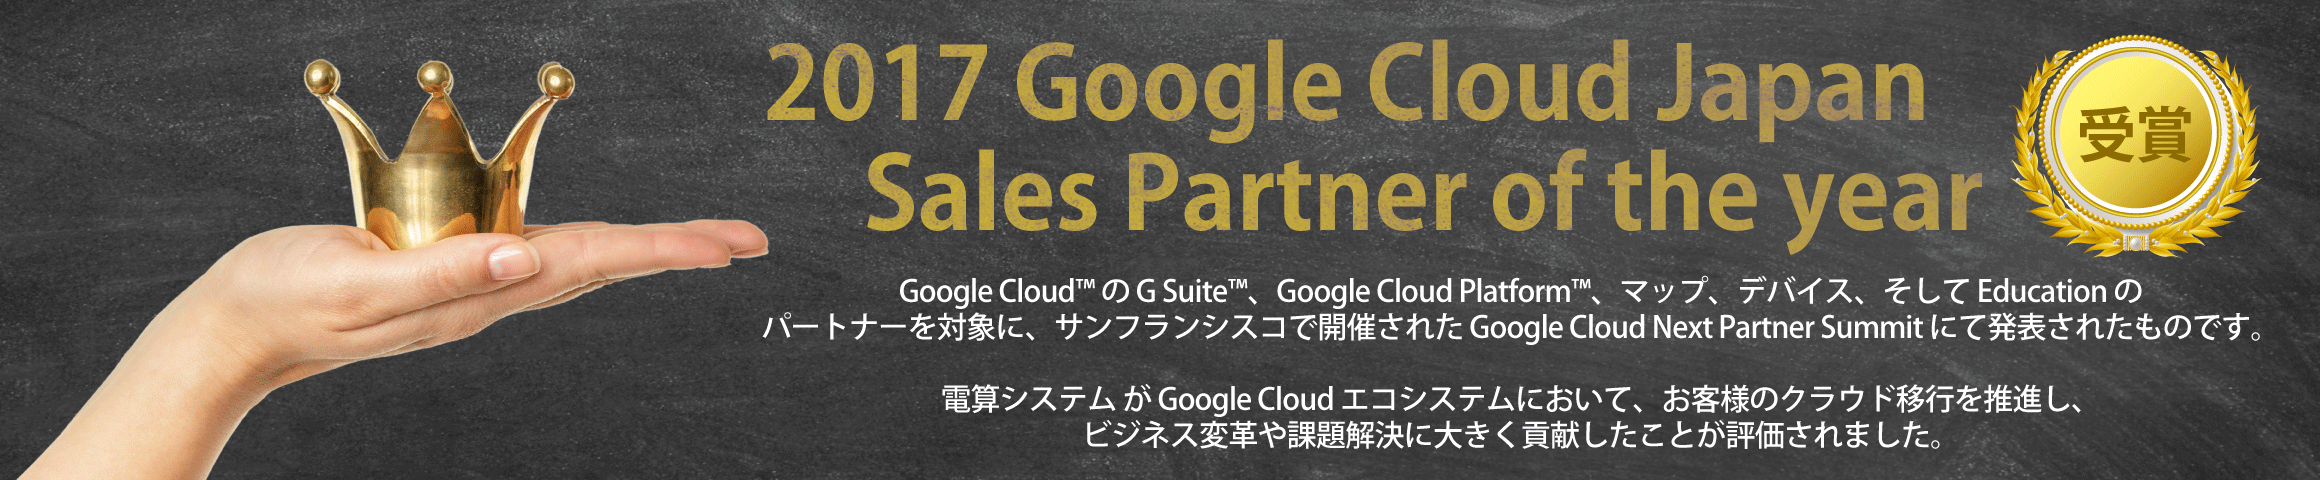 2017GoogleCloudJapanSalesPartneroftheYear